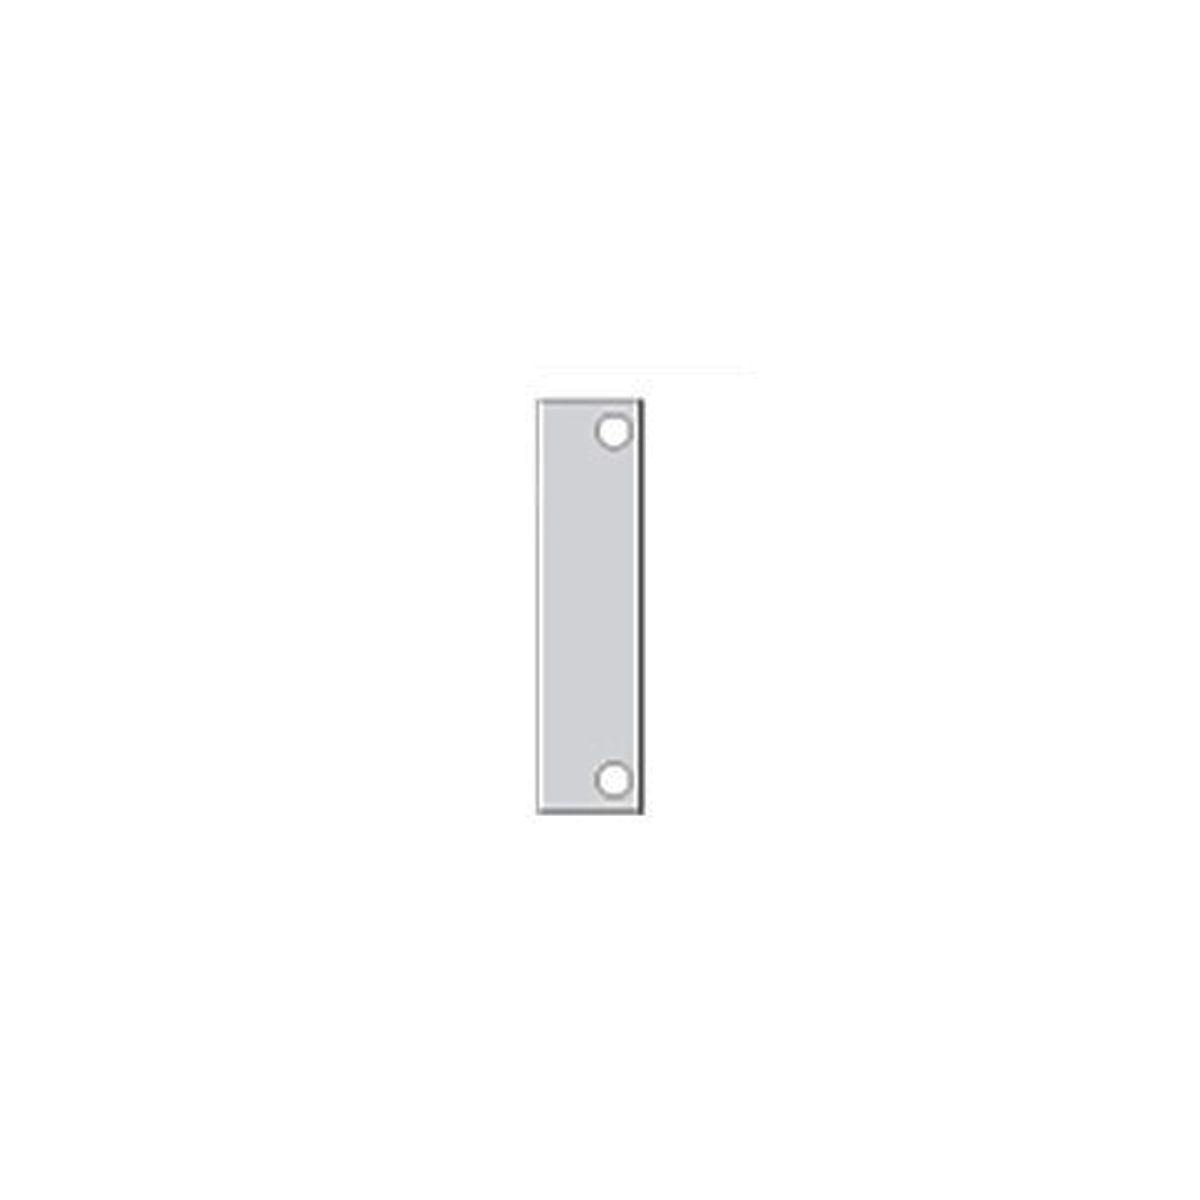 Intellijel Blanking Eurorack Panel - 1U - 2hp